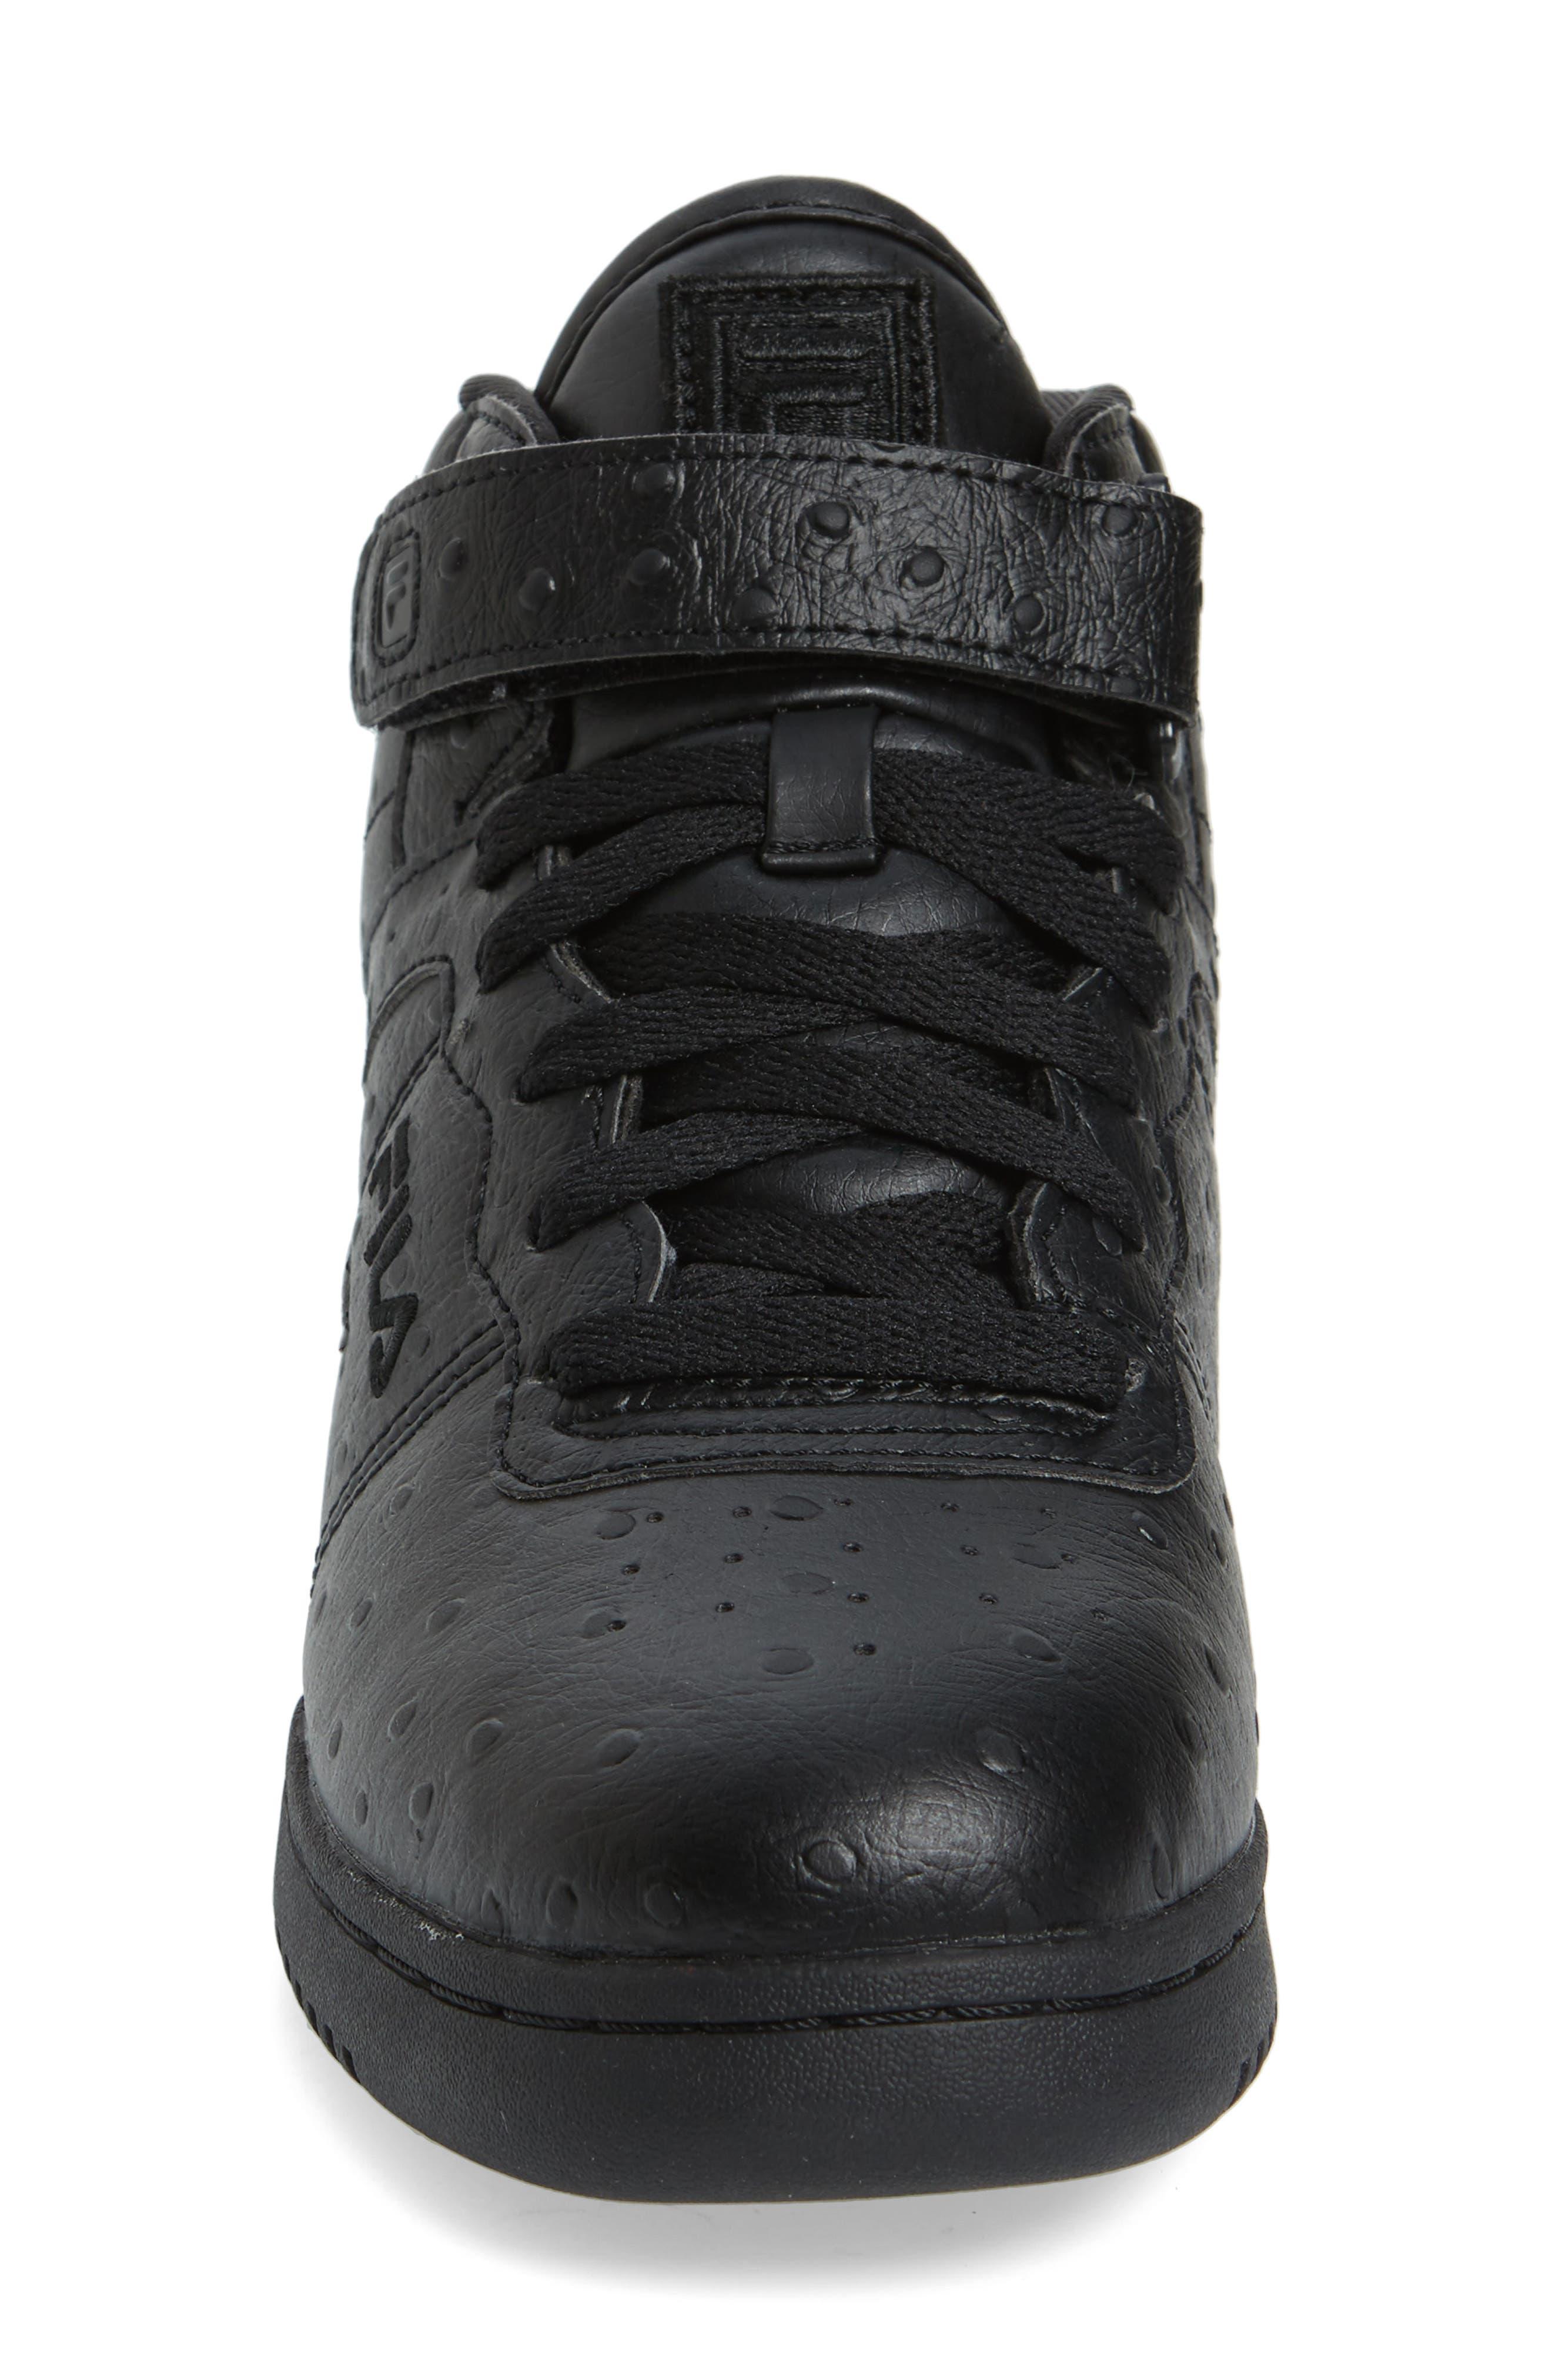 FILA,                             F-13 Ostrich Embossed High Top Sneaker,                             Alternate thumbnail 3, color,                             TRIPLE BLACK